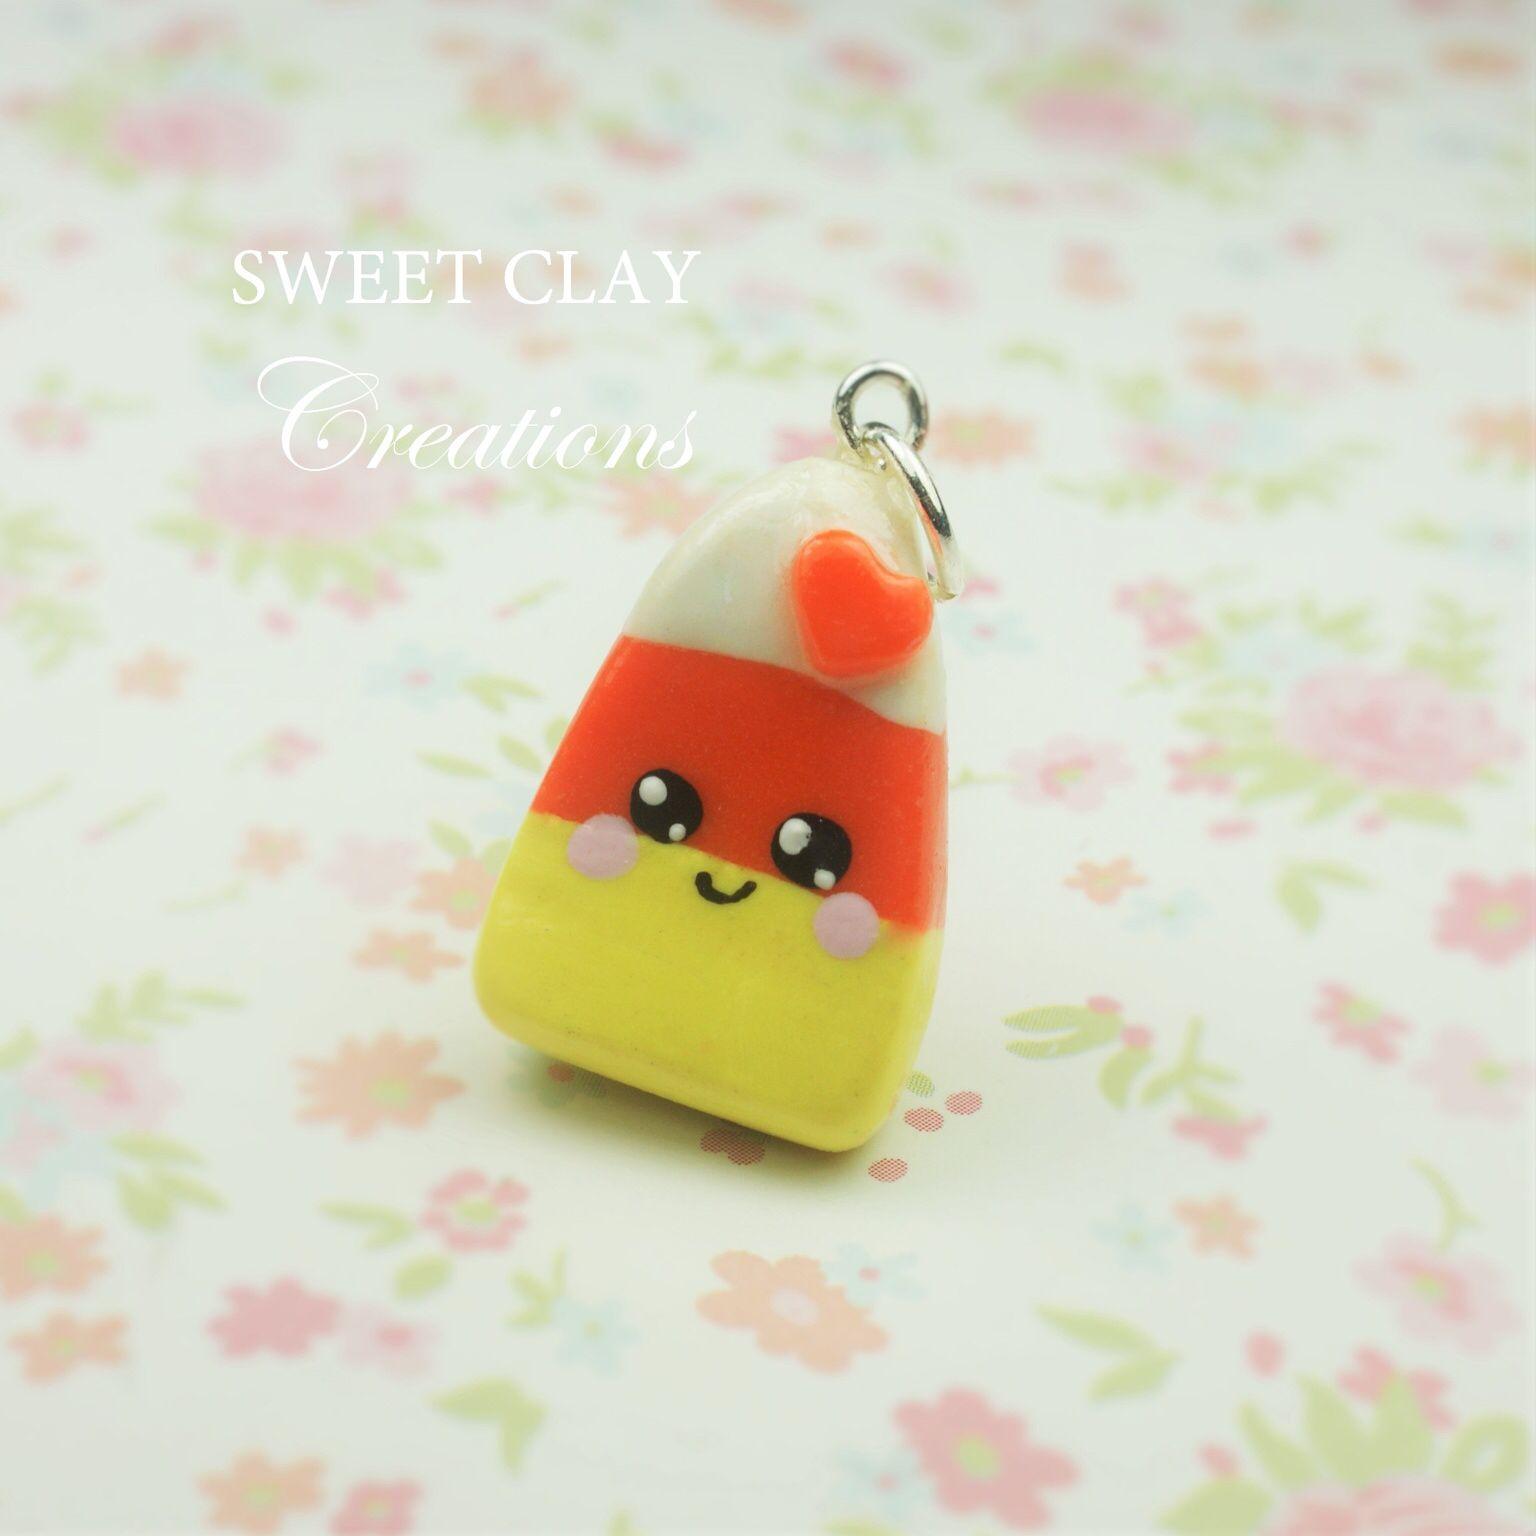 Candy Corn Kawaii Charm Polymer Clay Miniature Food Jewelry Handmade By  Sweet Clay Creations